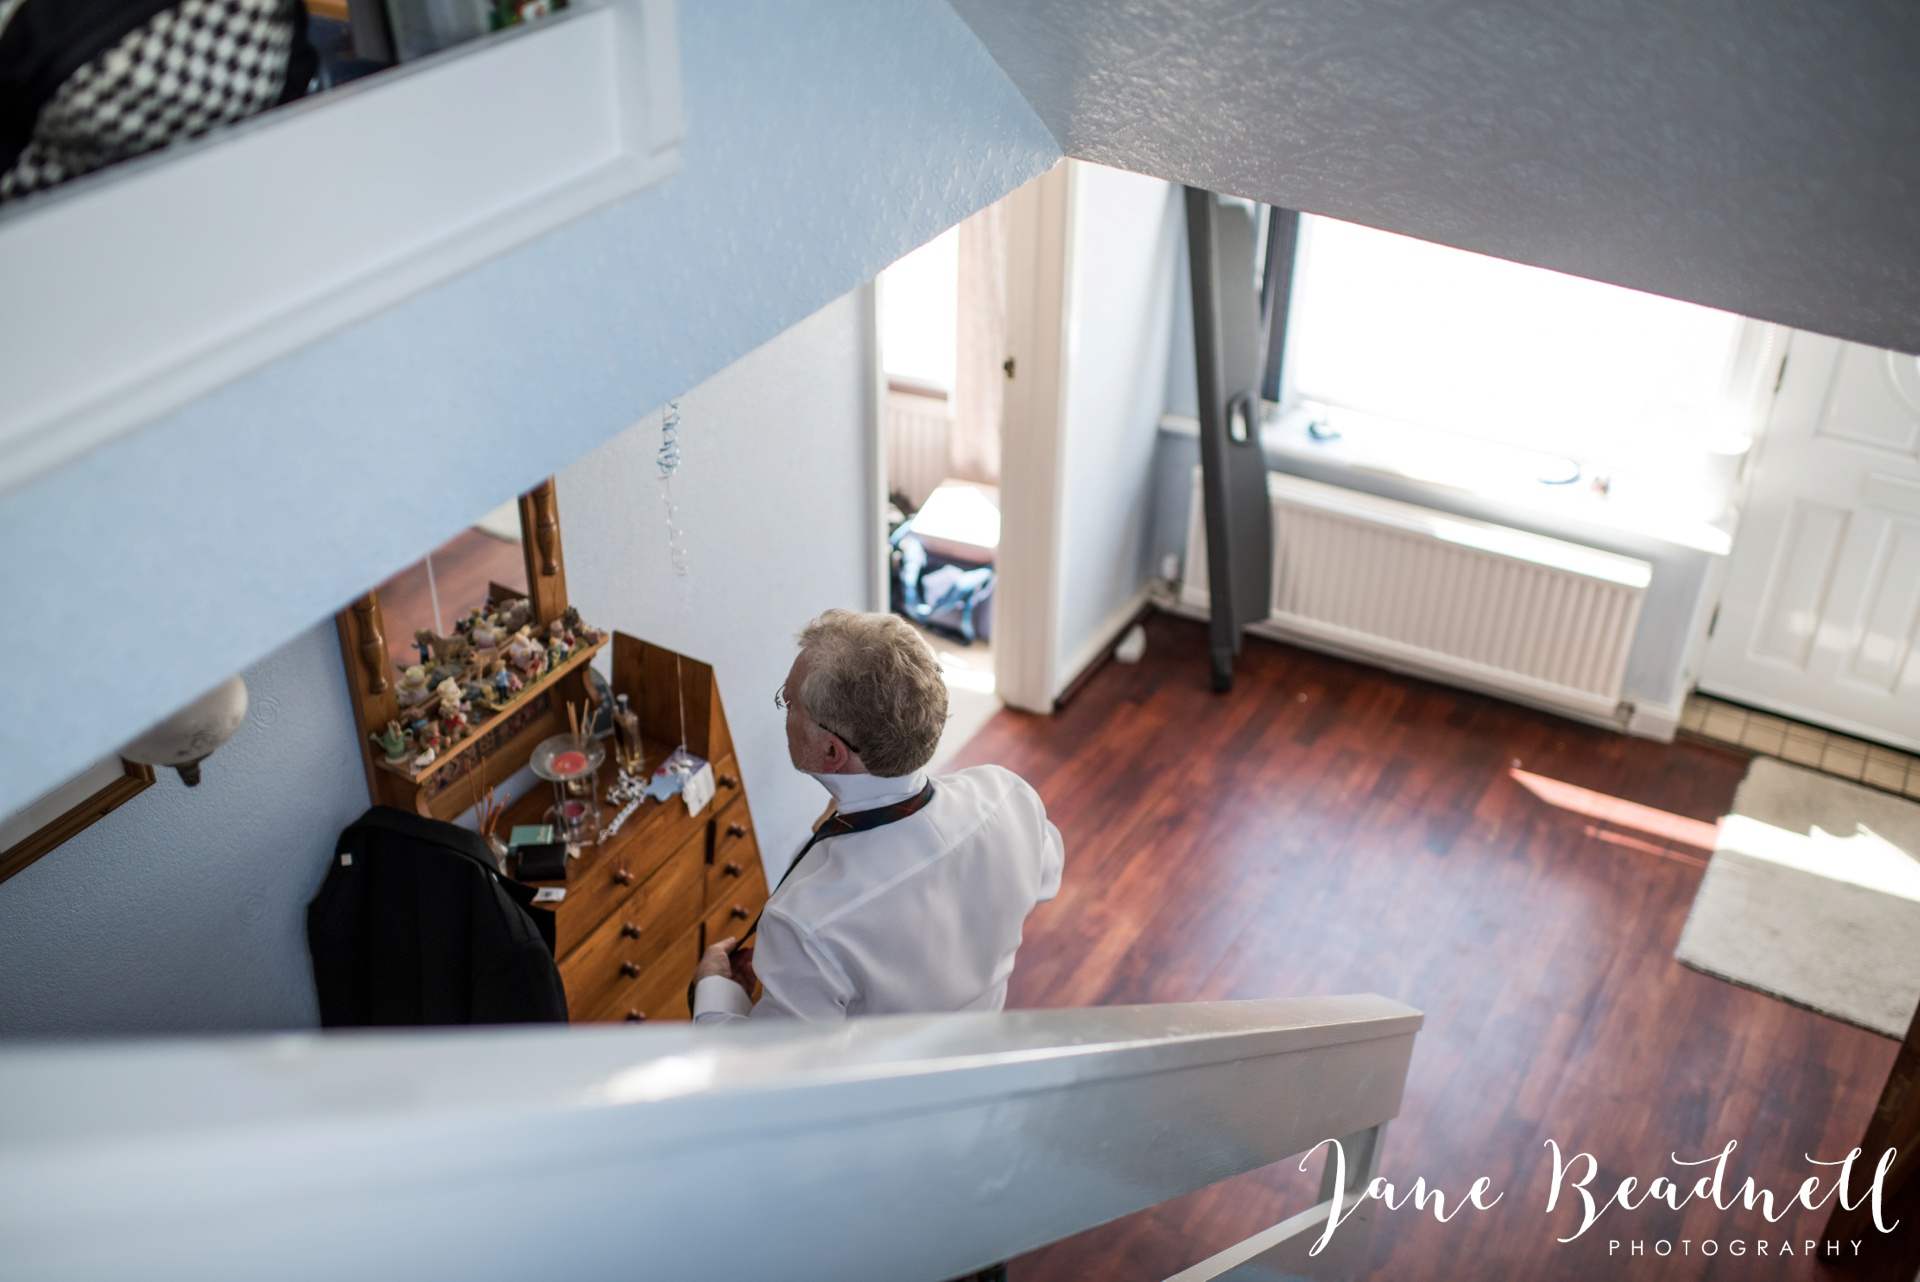 yorkshire-fine-art-wedding-photographer-jane-beadnell-photography-poppleton-york_0006